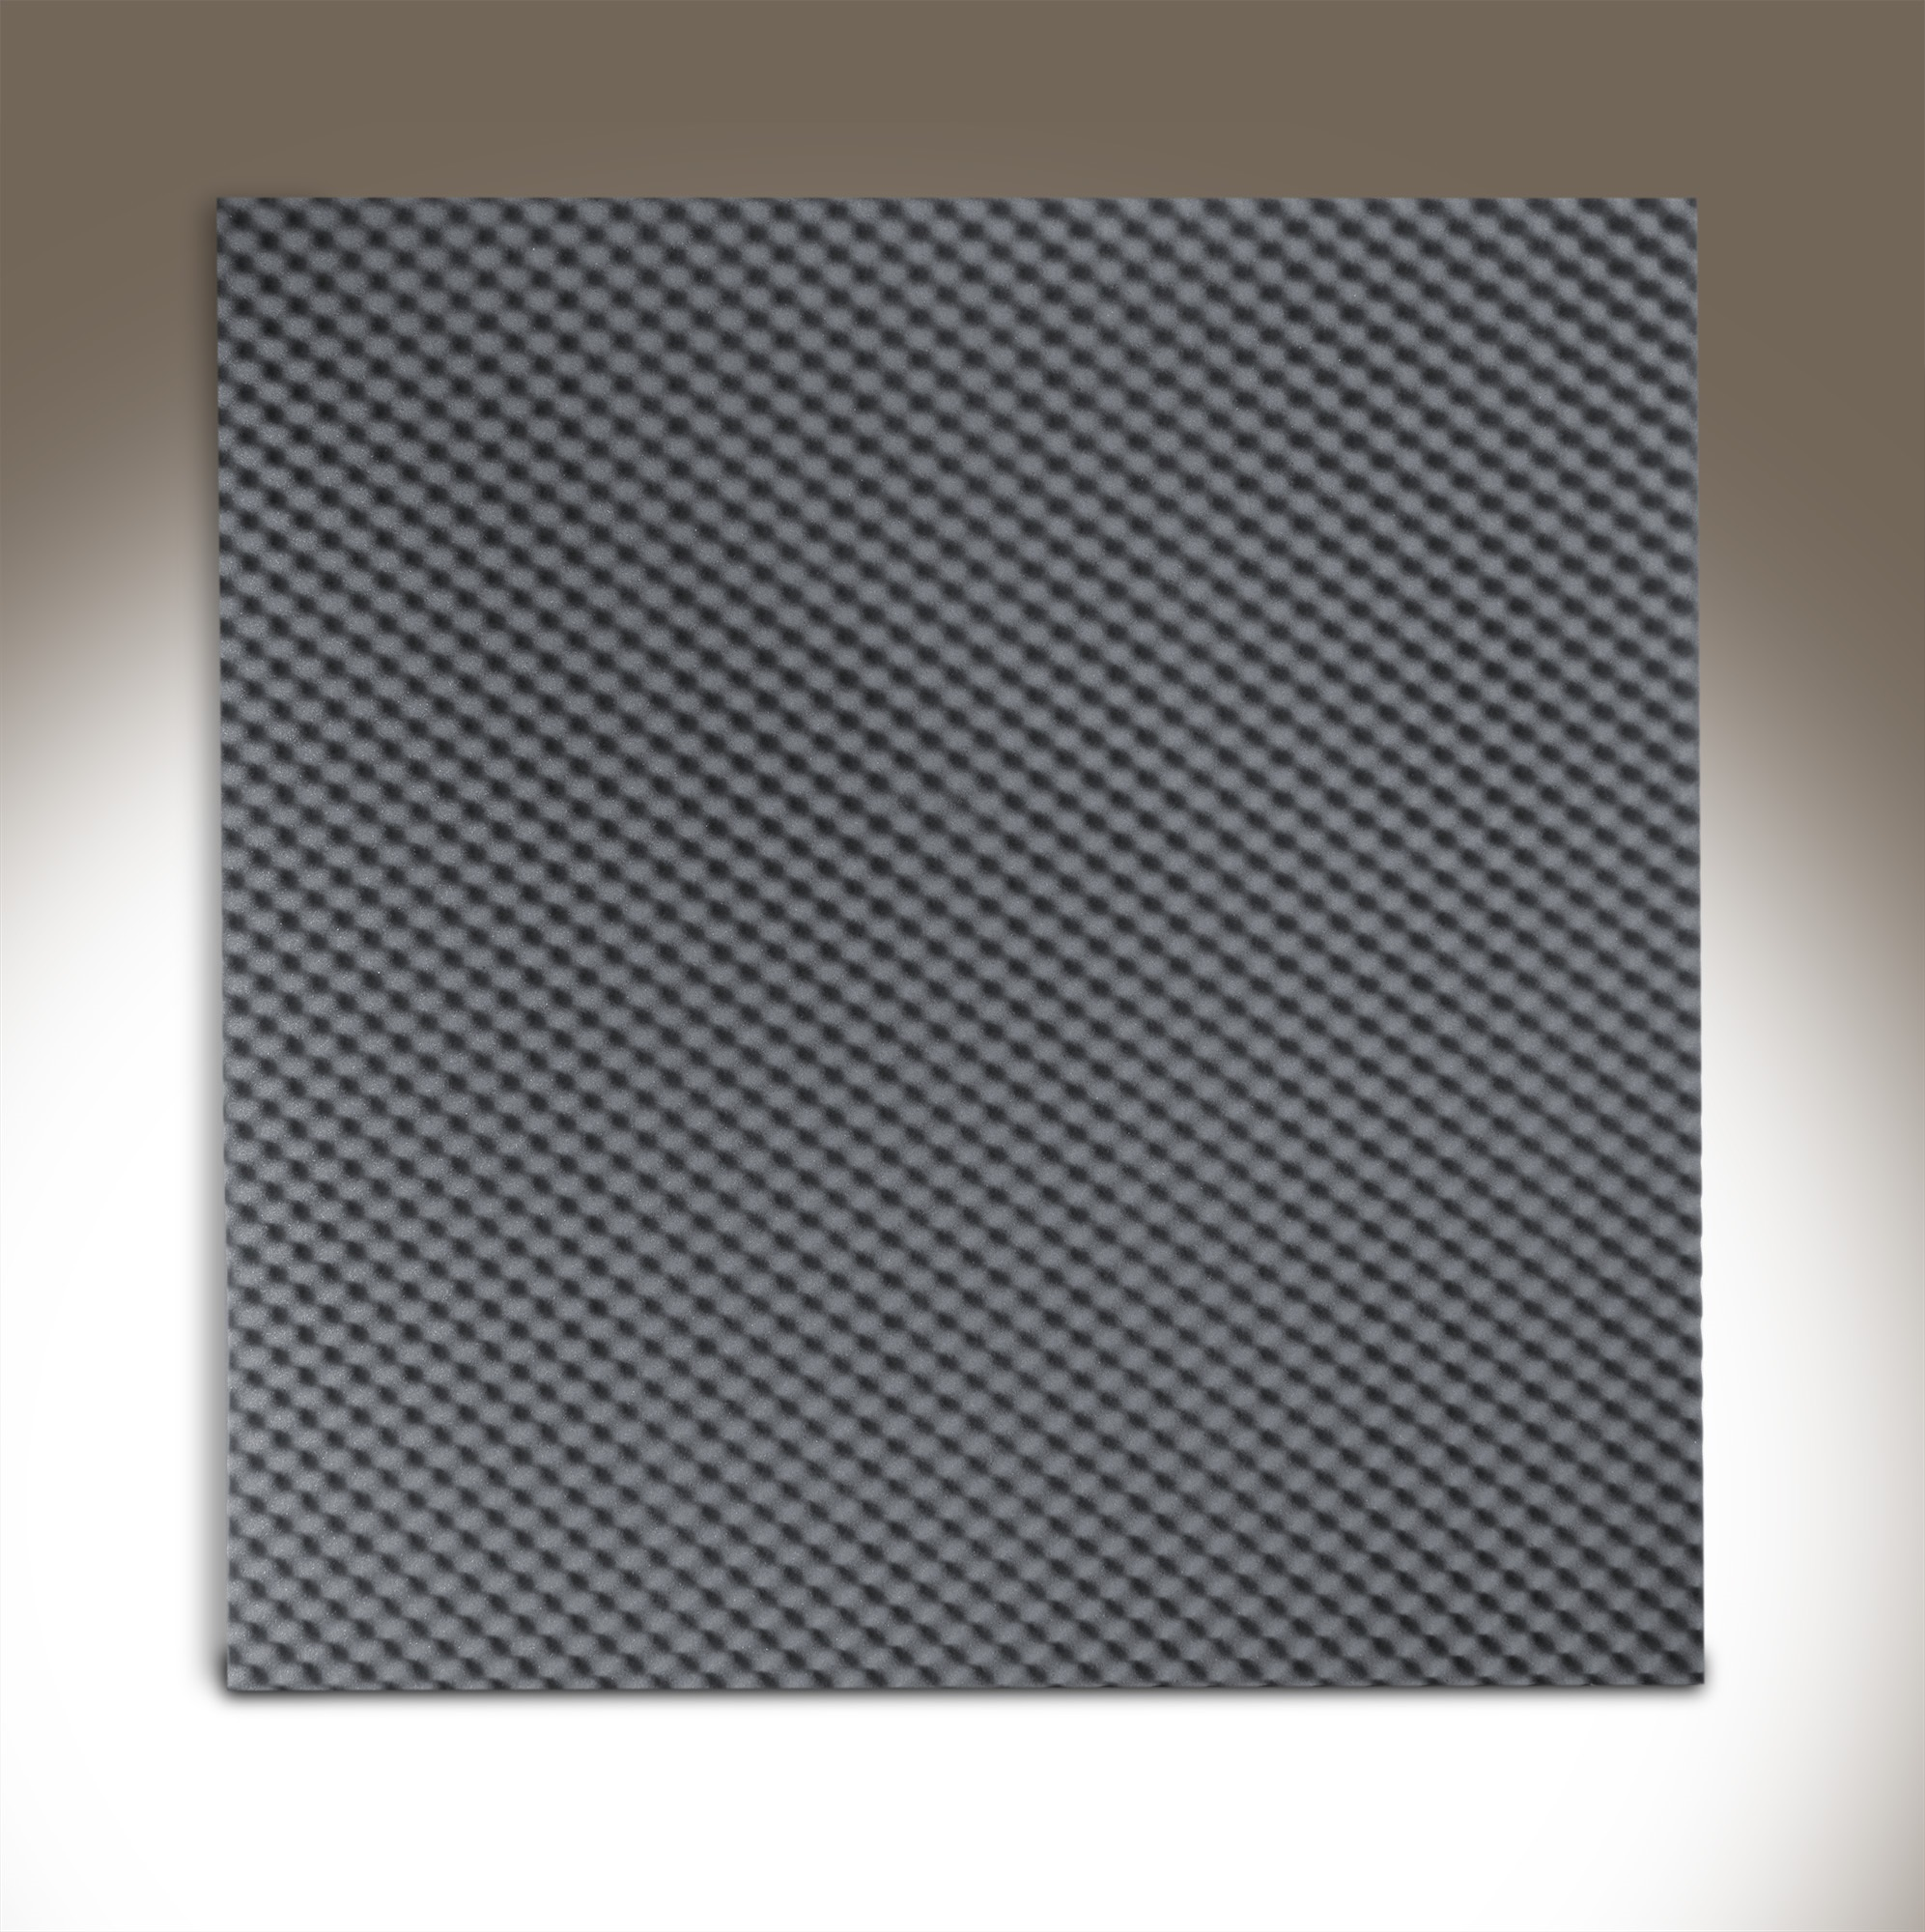 Pyramid Waves 25mm